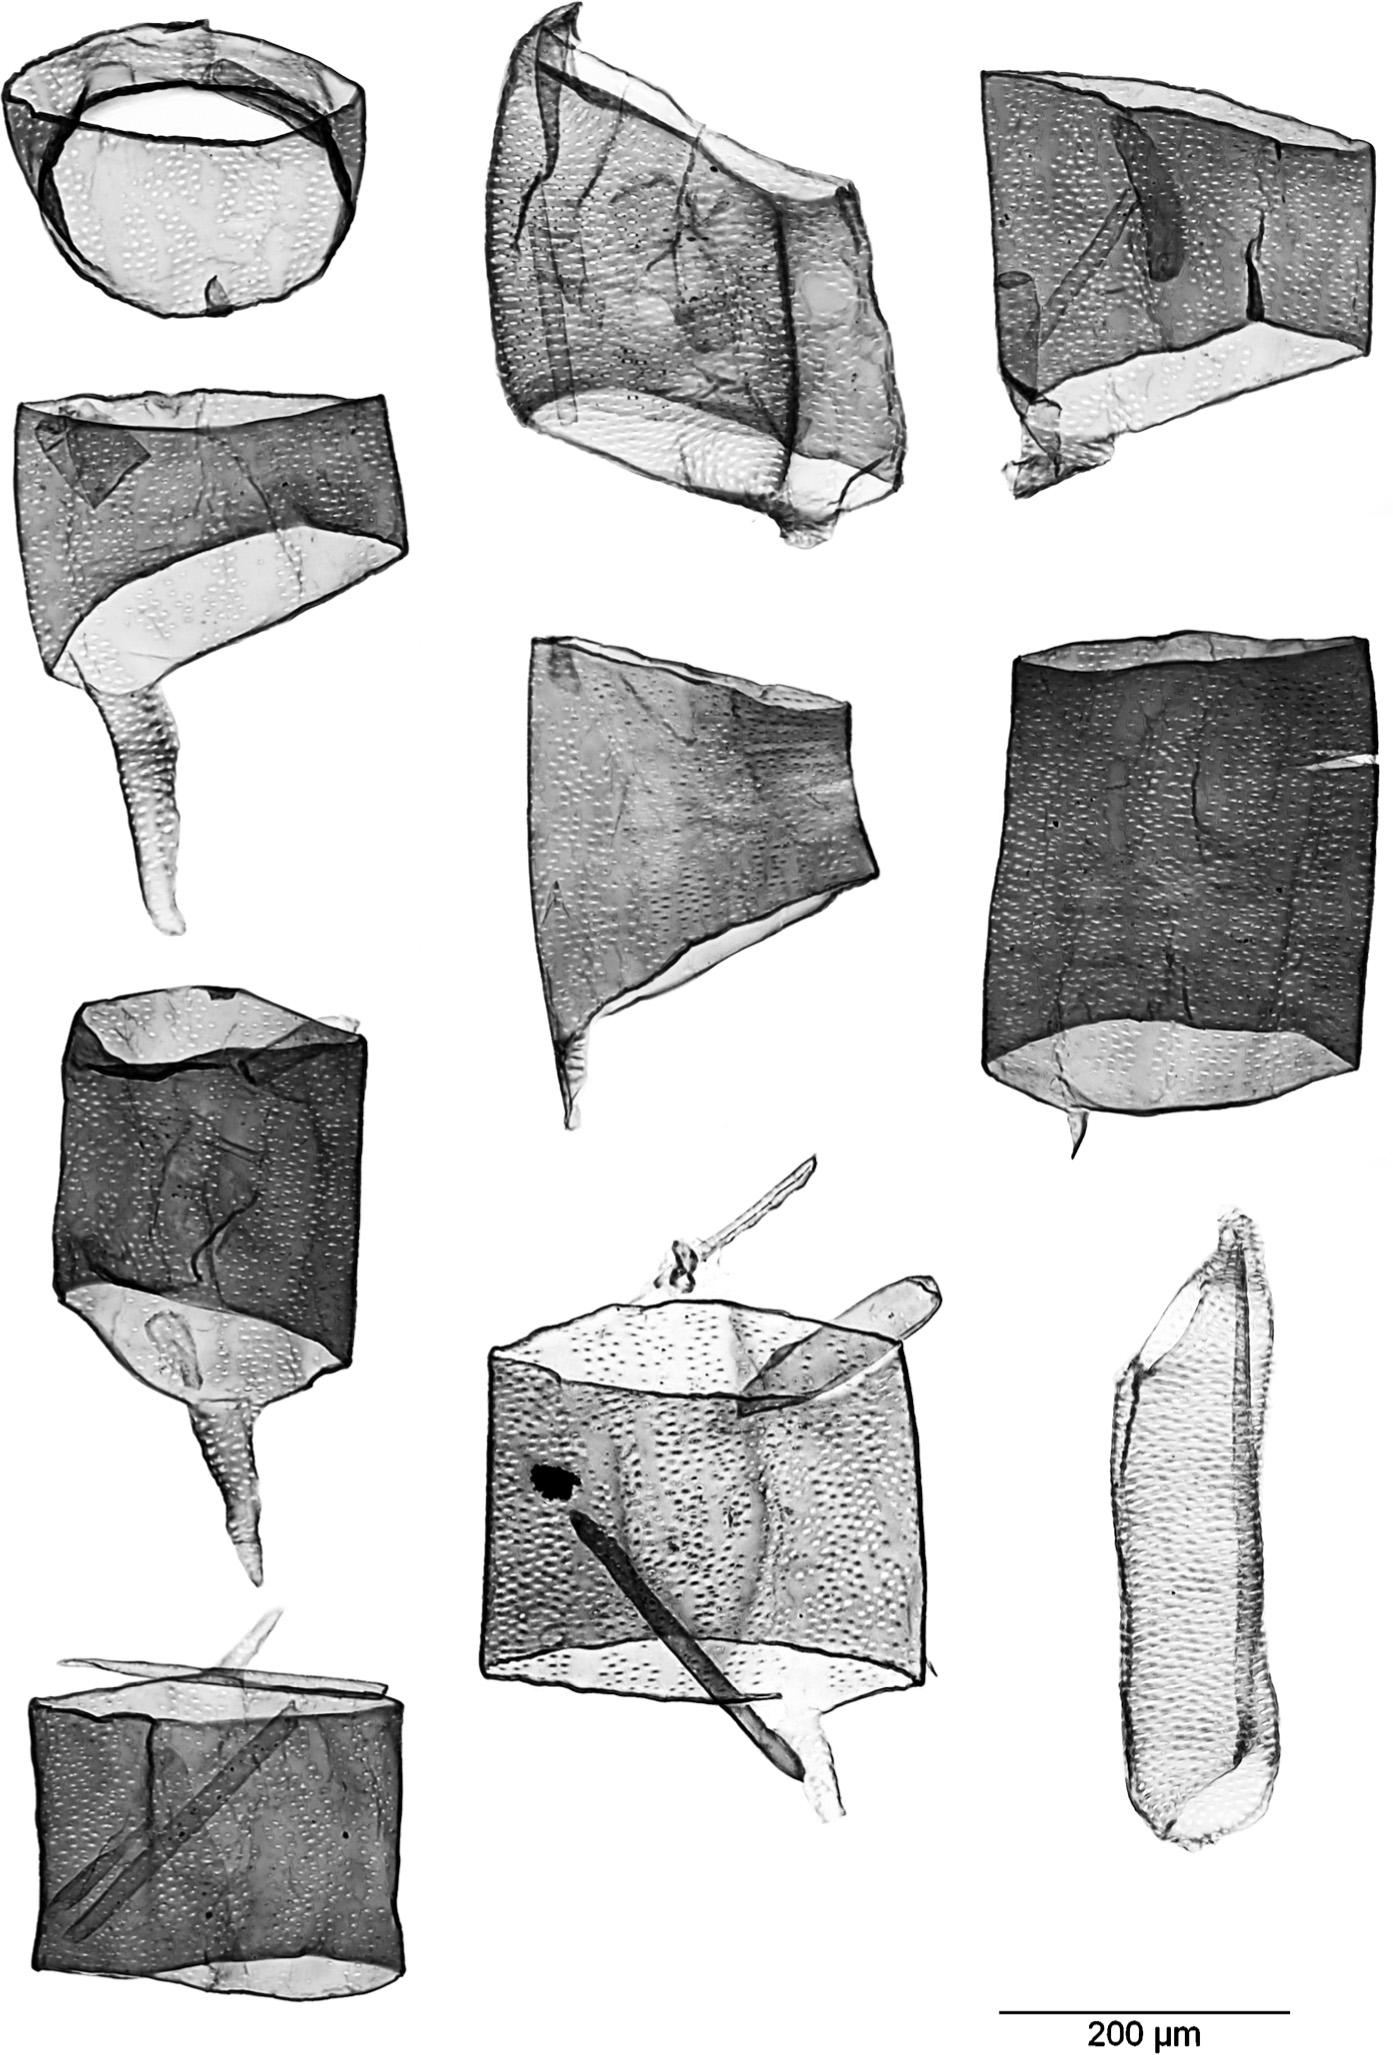 ATLAS OF VESSEL ELEMENTS In IAWA Journal Volume 39 Issue 3